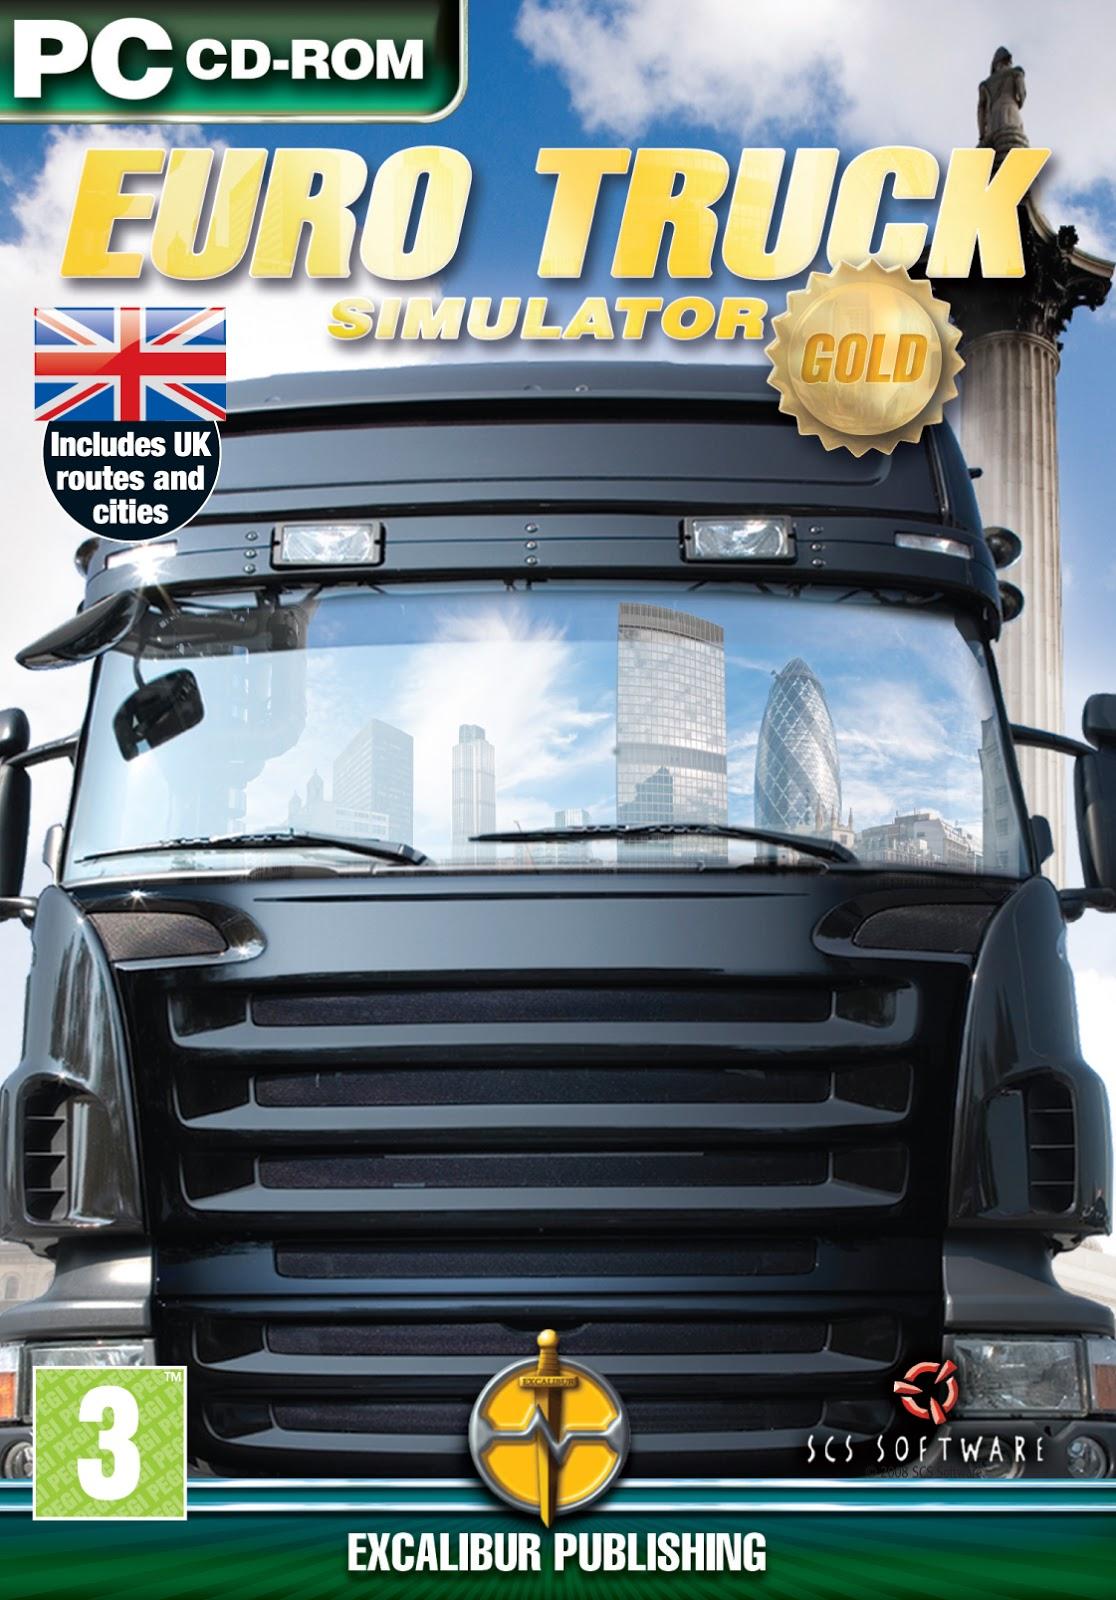 Descargar Euro Truck Simulator gold pc full español por mega y google drive /